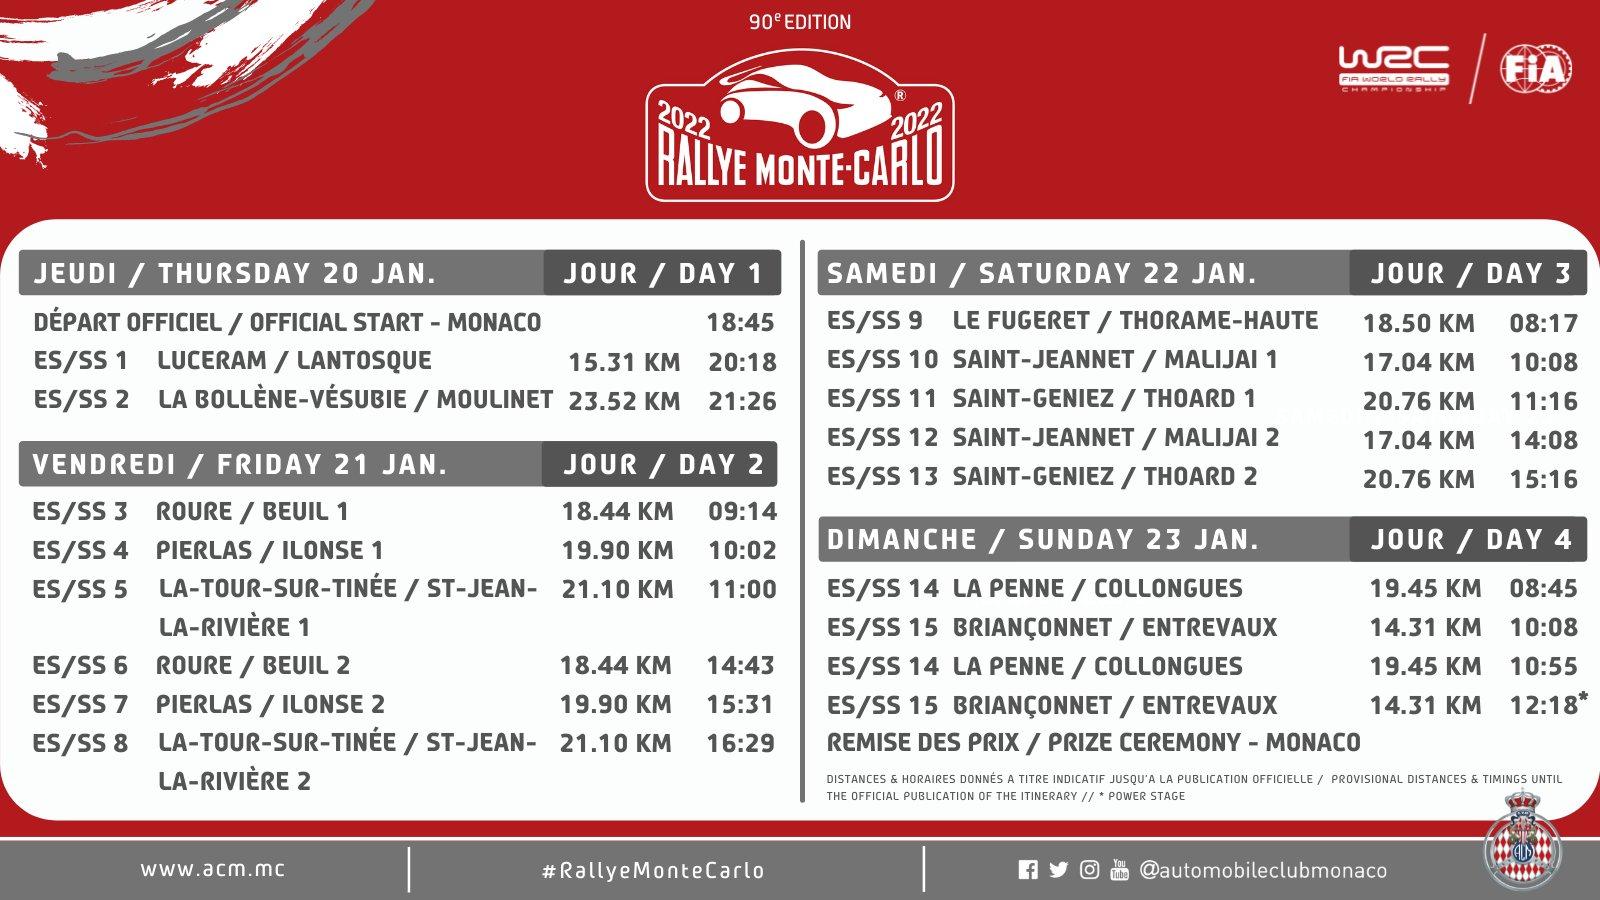 World Rally Championship: Temporada 2021  - Página 32 E6-GqpFXoAMQigA?format=jpg&name=large